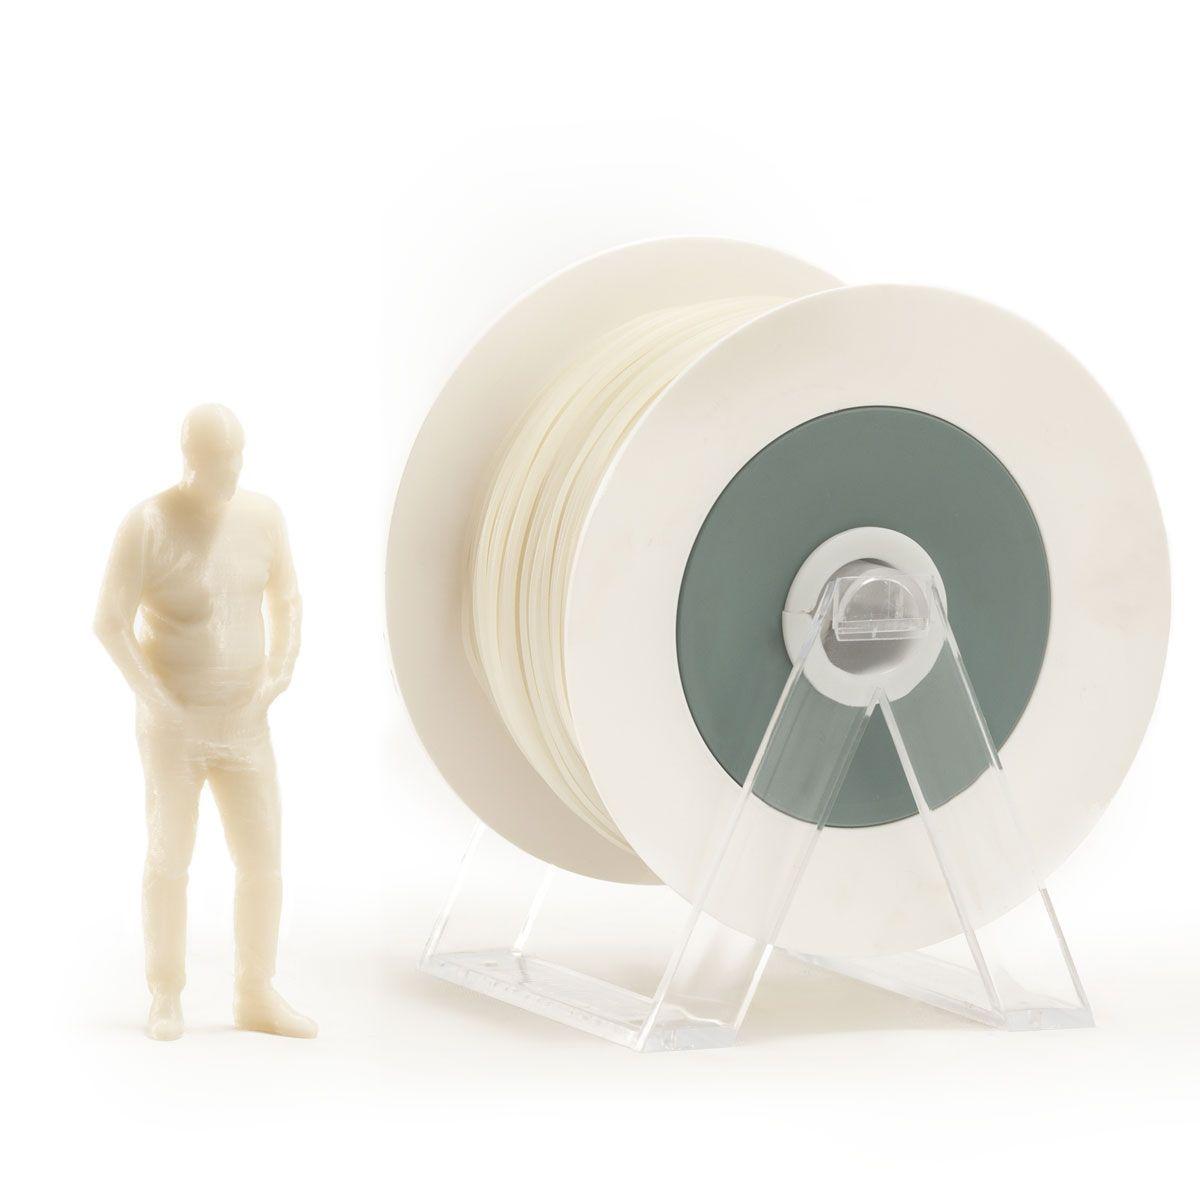 PLA Filament | Color: Photoluminescent Ivory White / Blue